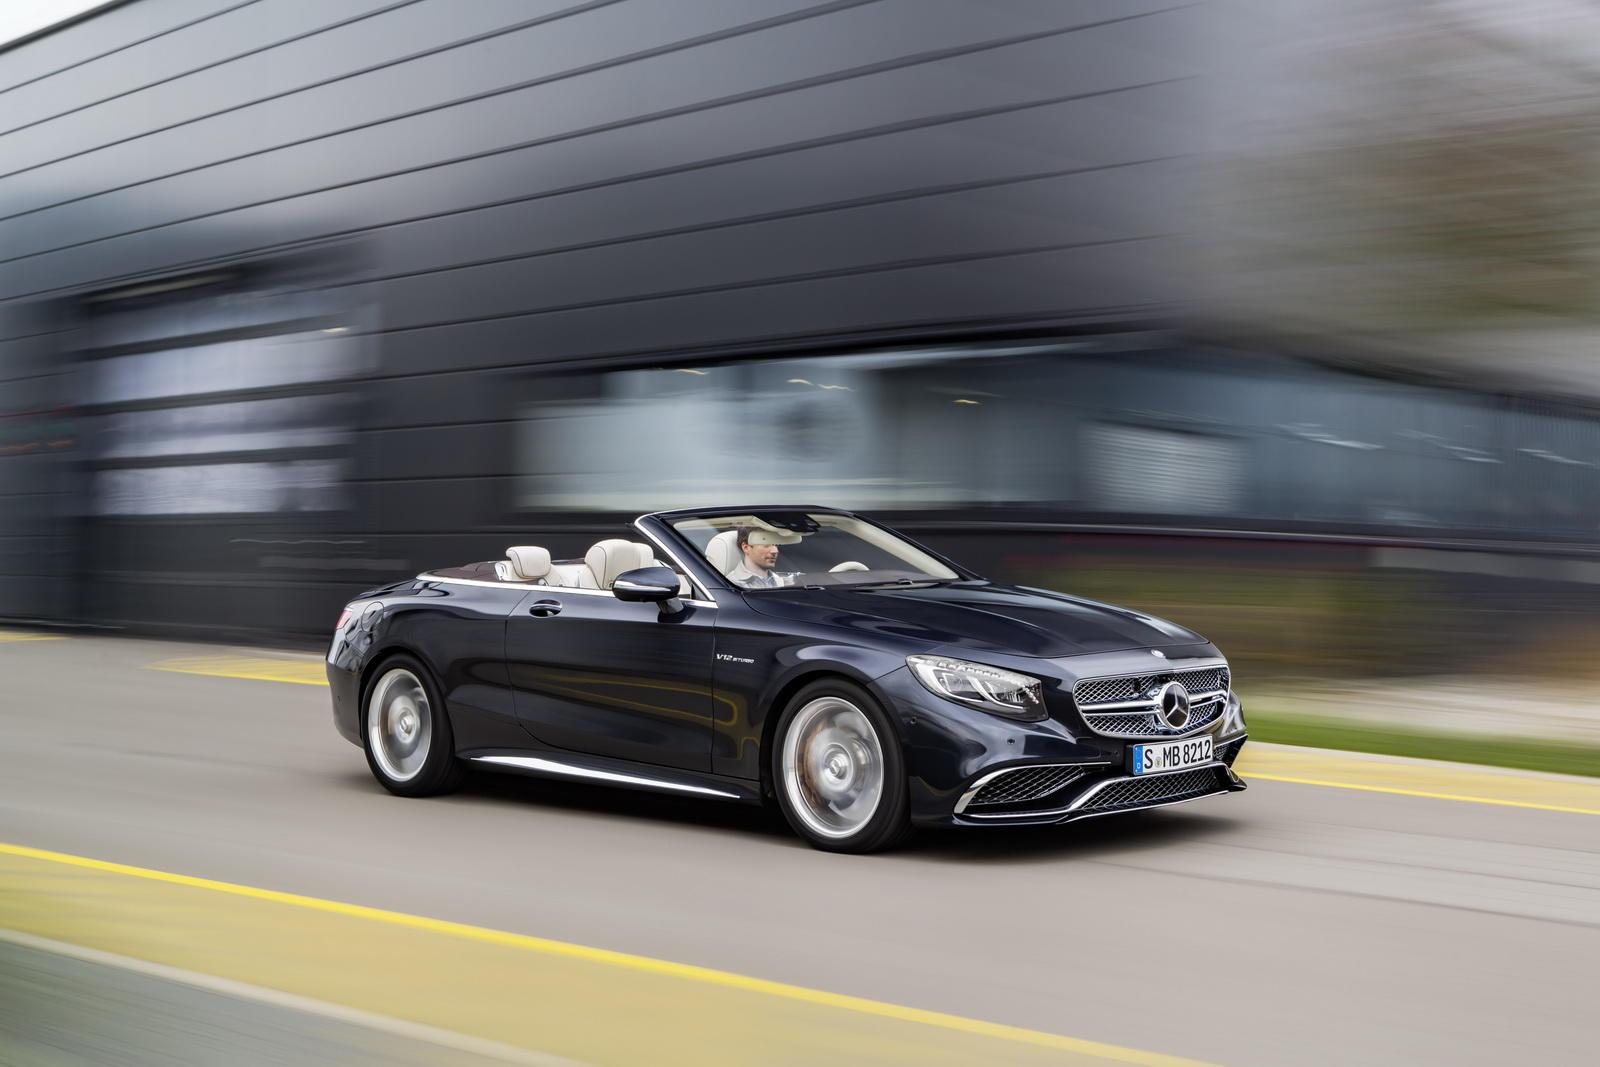 Mercedes S65 AMG Cabriolet - Mercedes S65 AMG Cabriolet